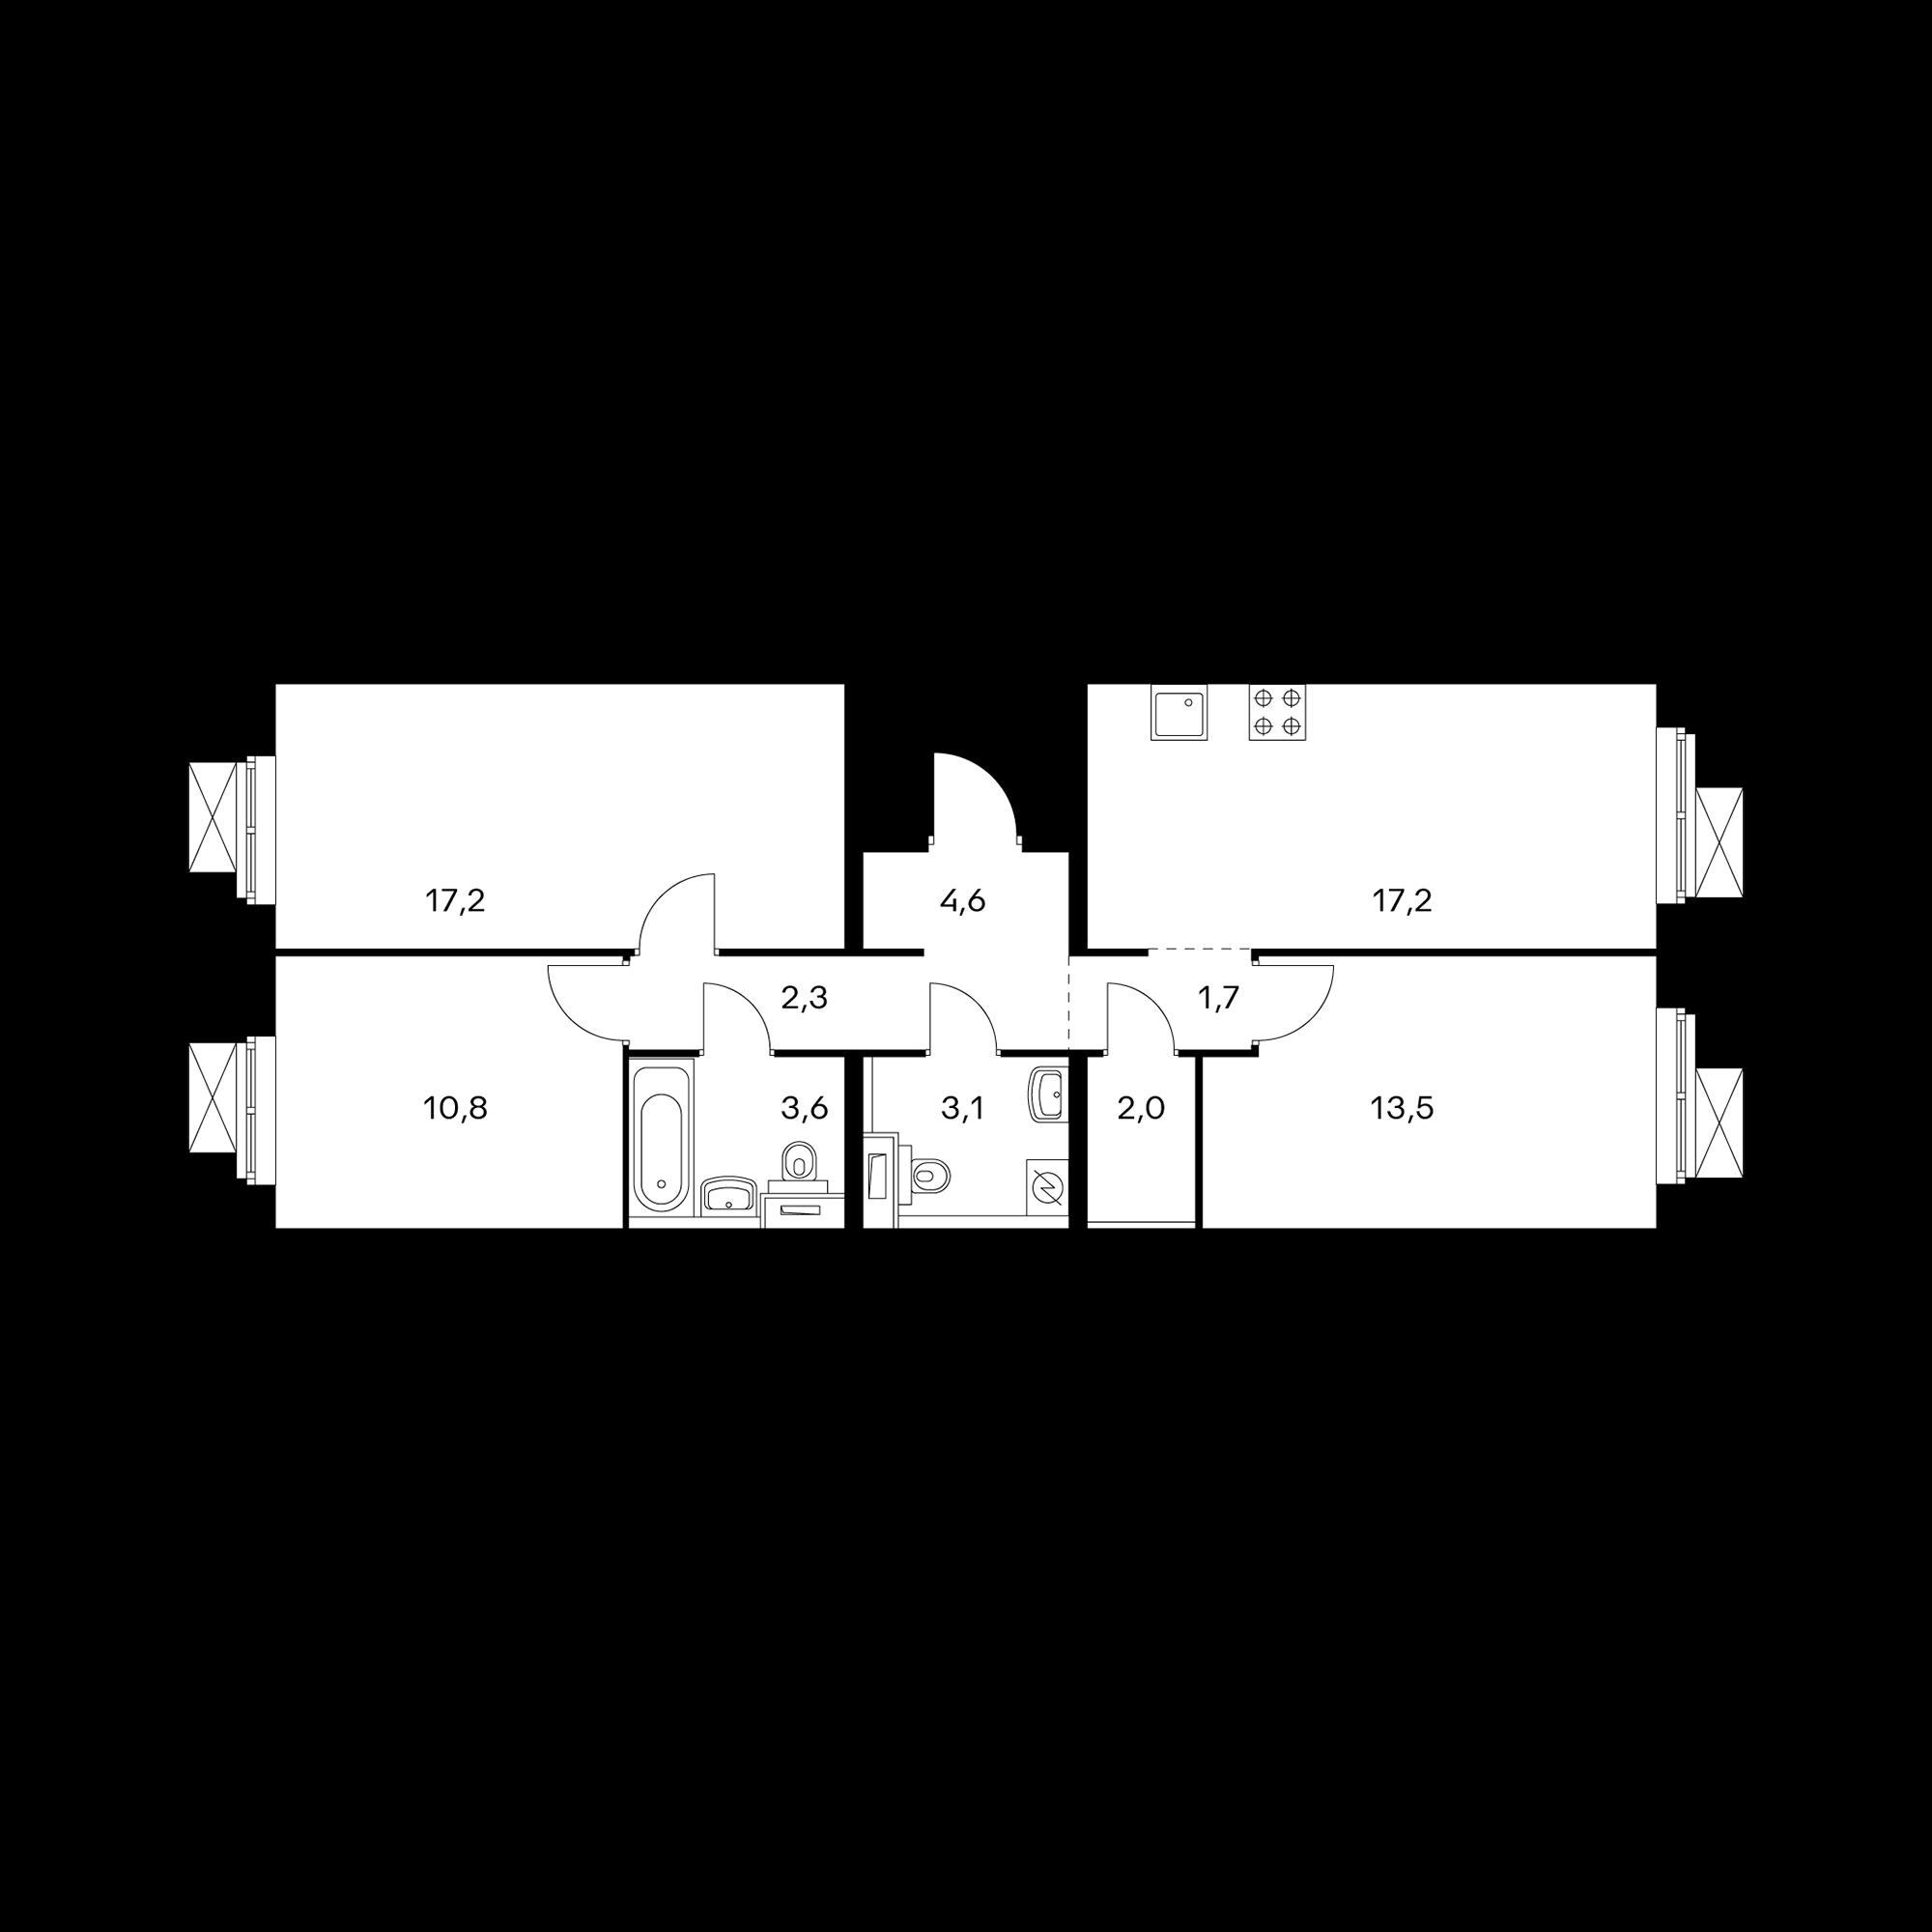 3KM15_6.0-1